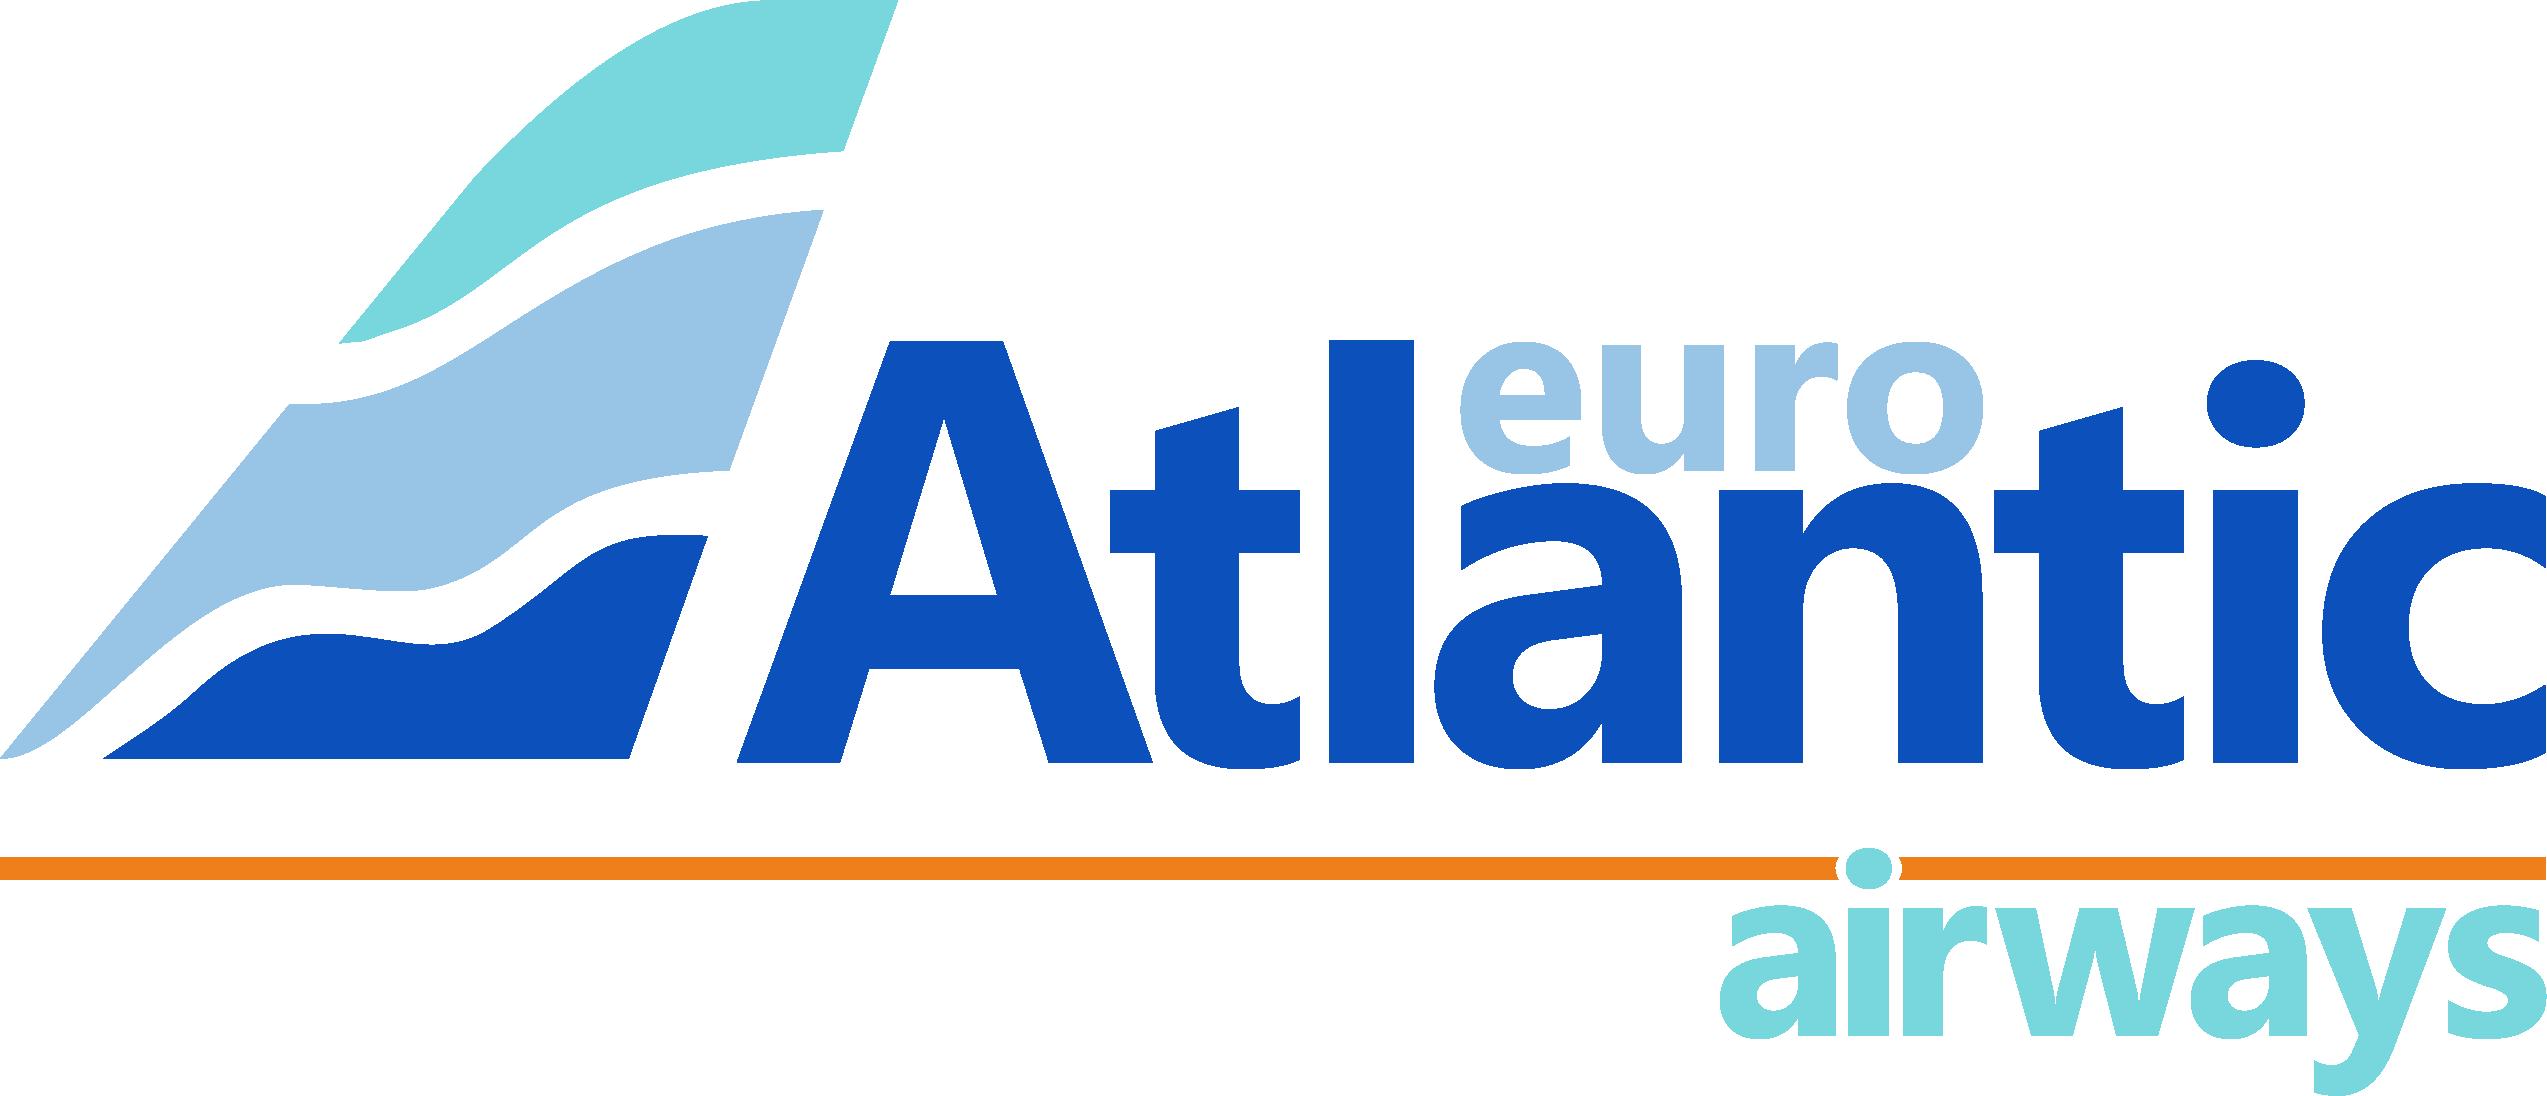 euroAtlantic Helpdesk